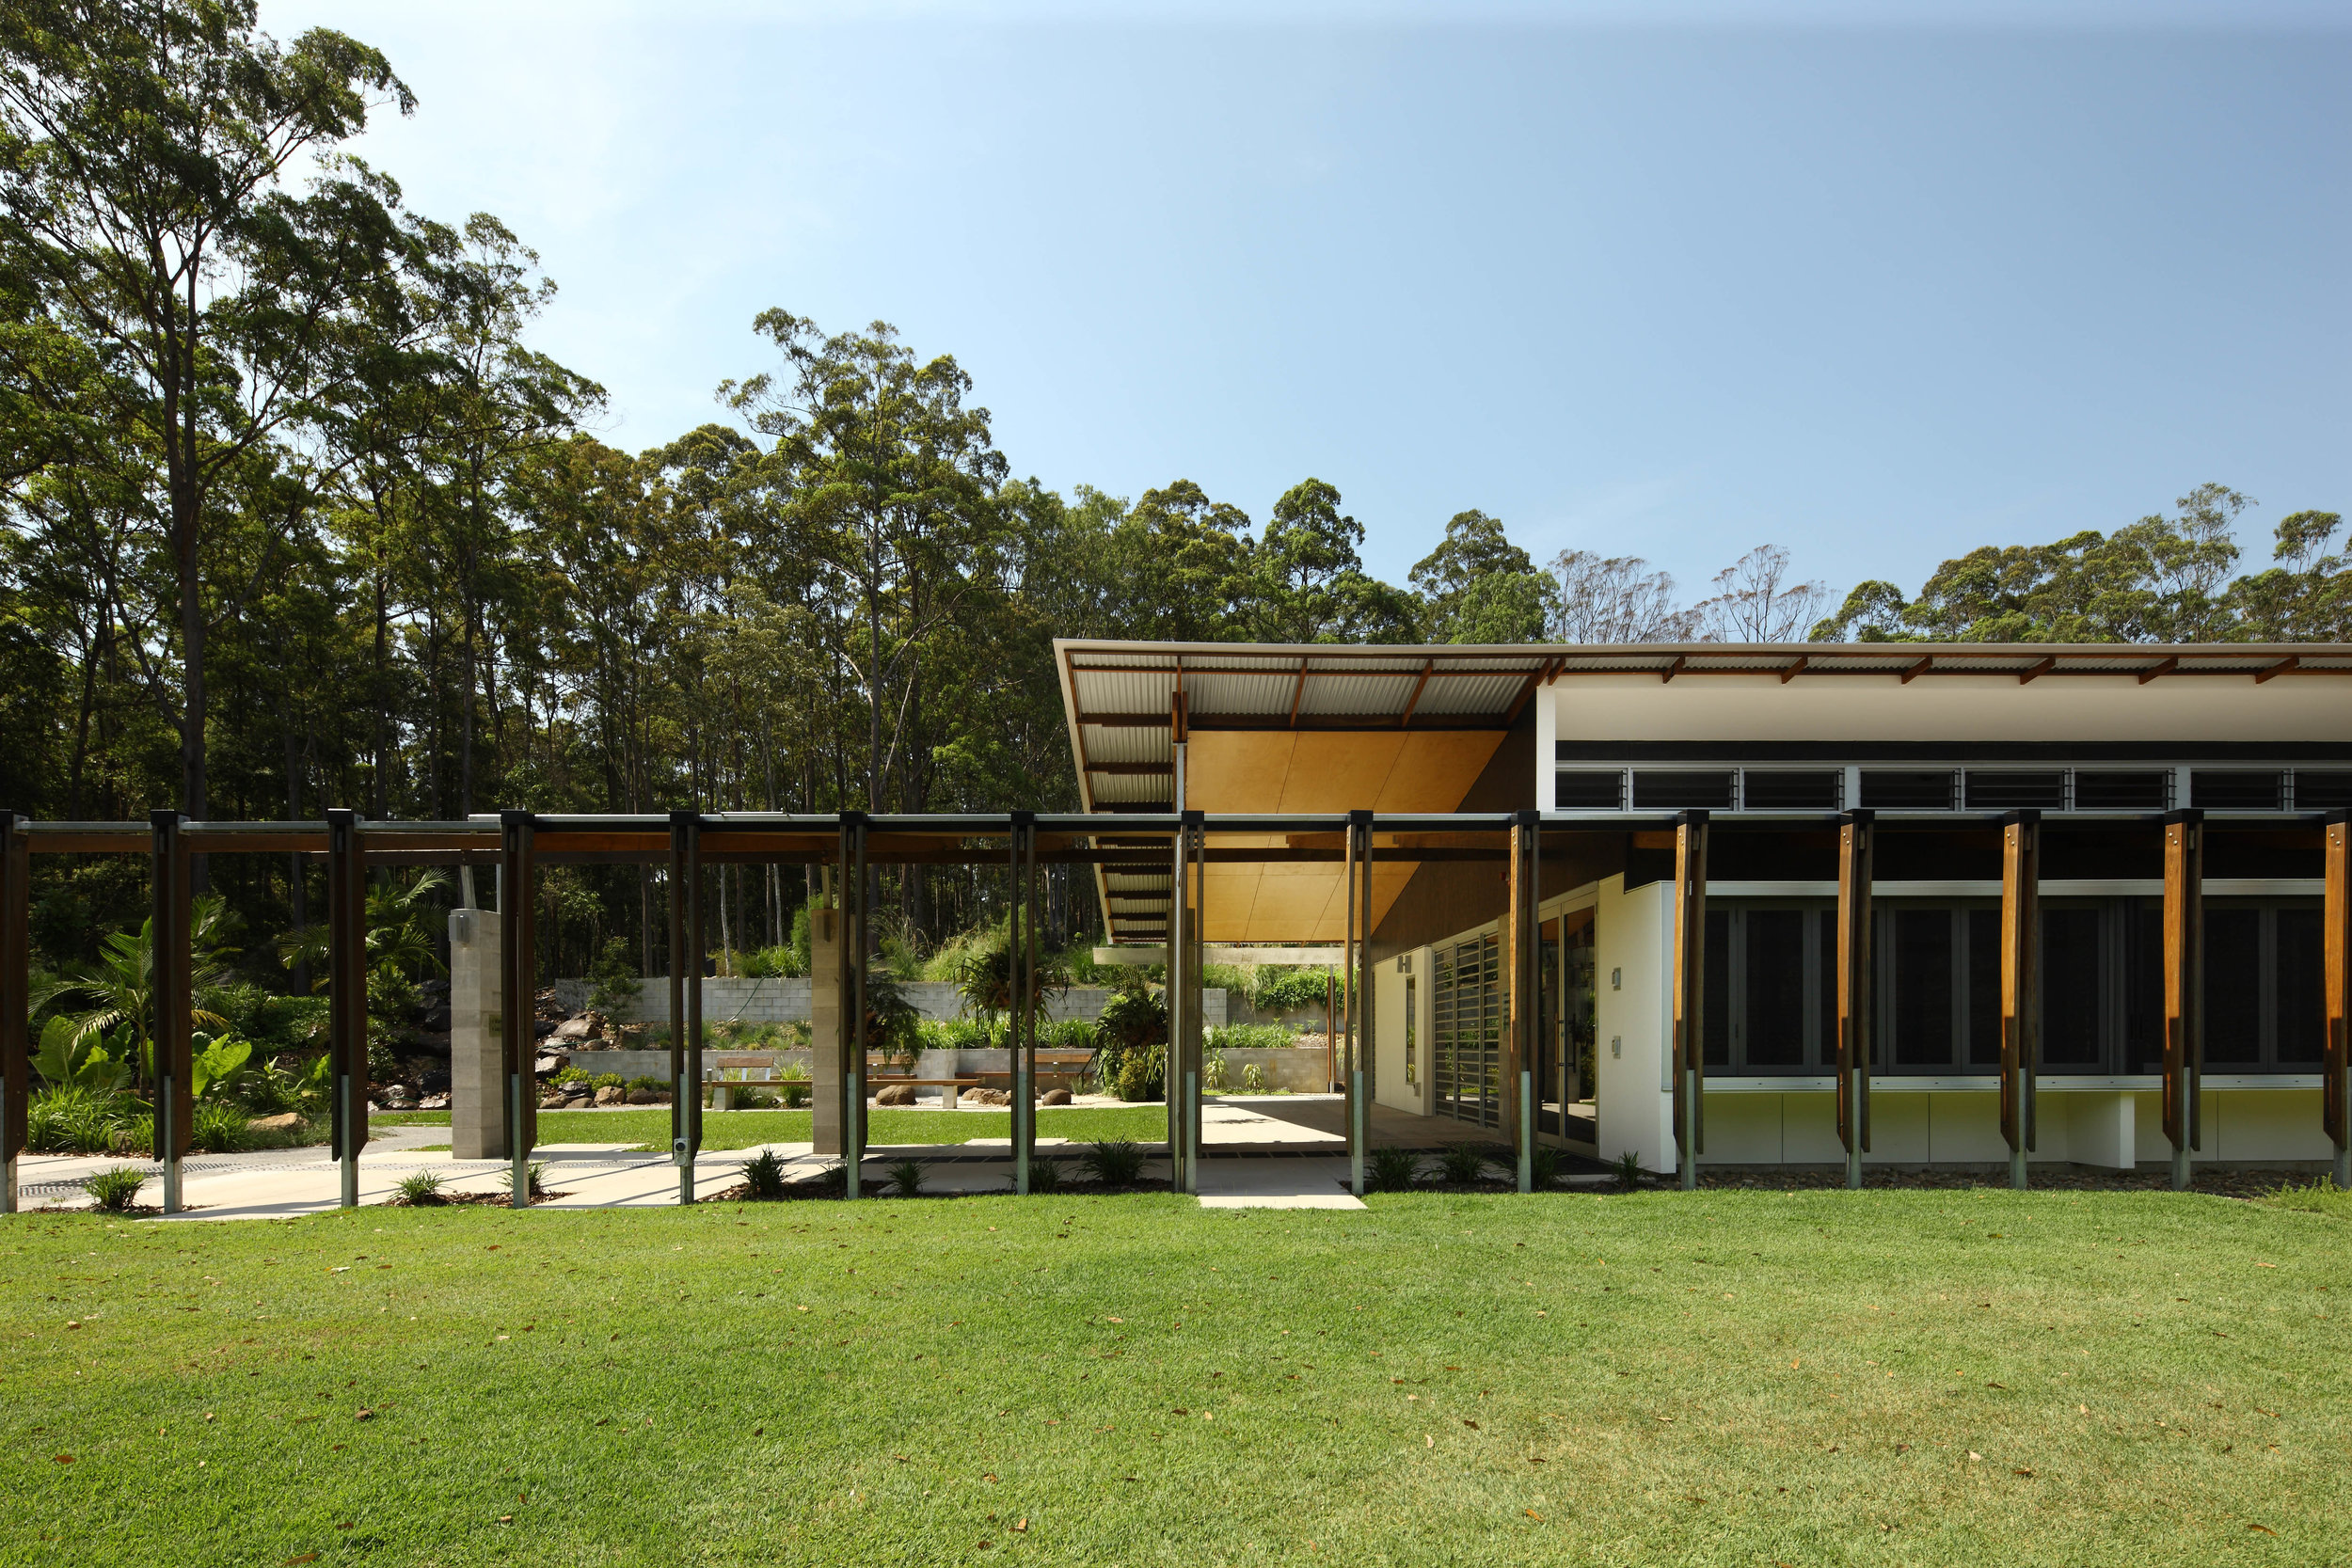 Maroochy-Botanic-Gardens-Guymer-Bailey-Architects-05.jpg